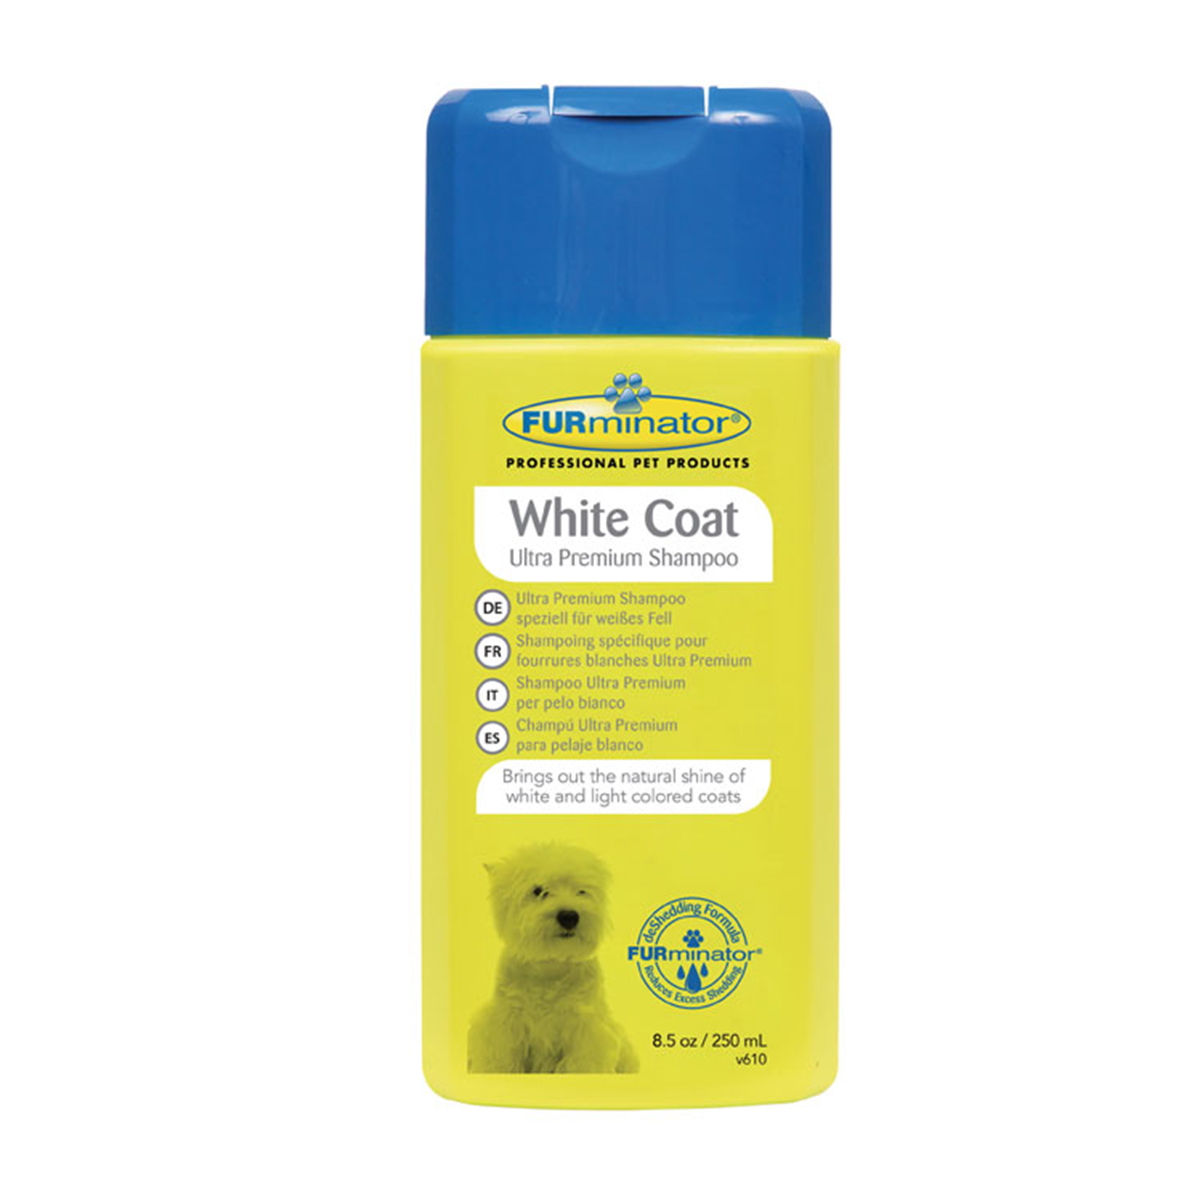 Furminator Sampon White Coat, 250 ml imagine